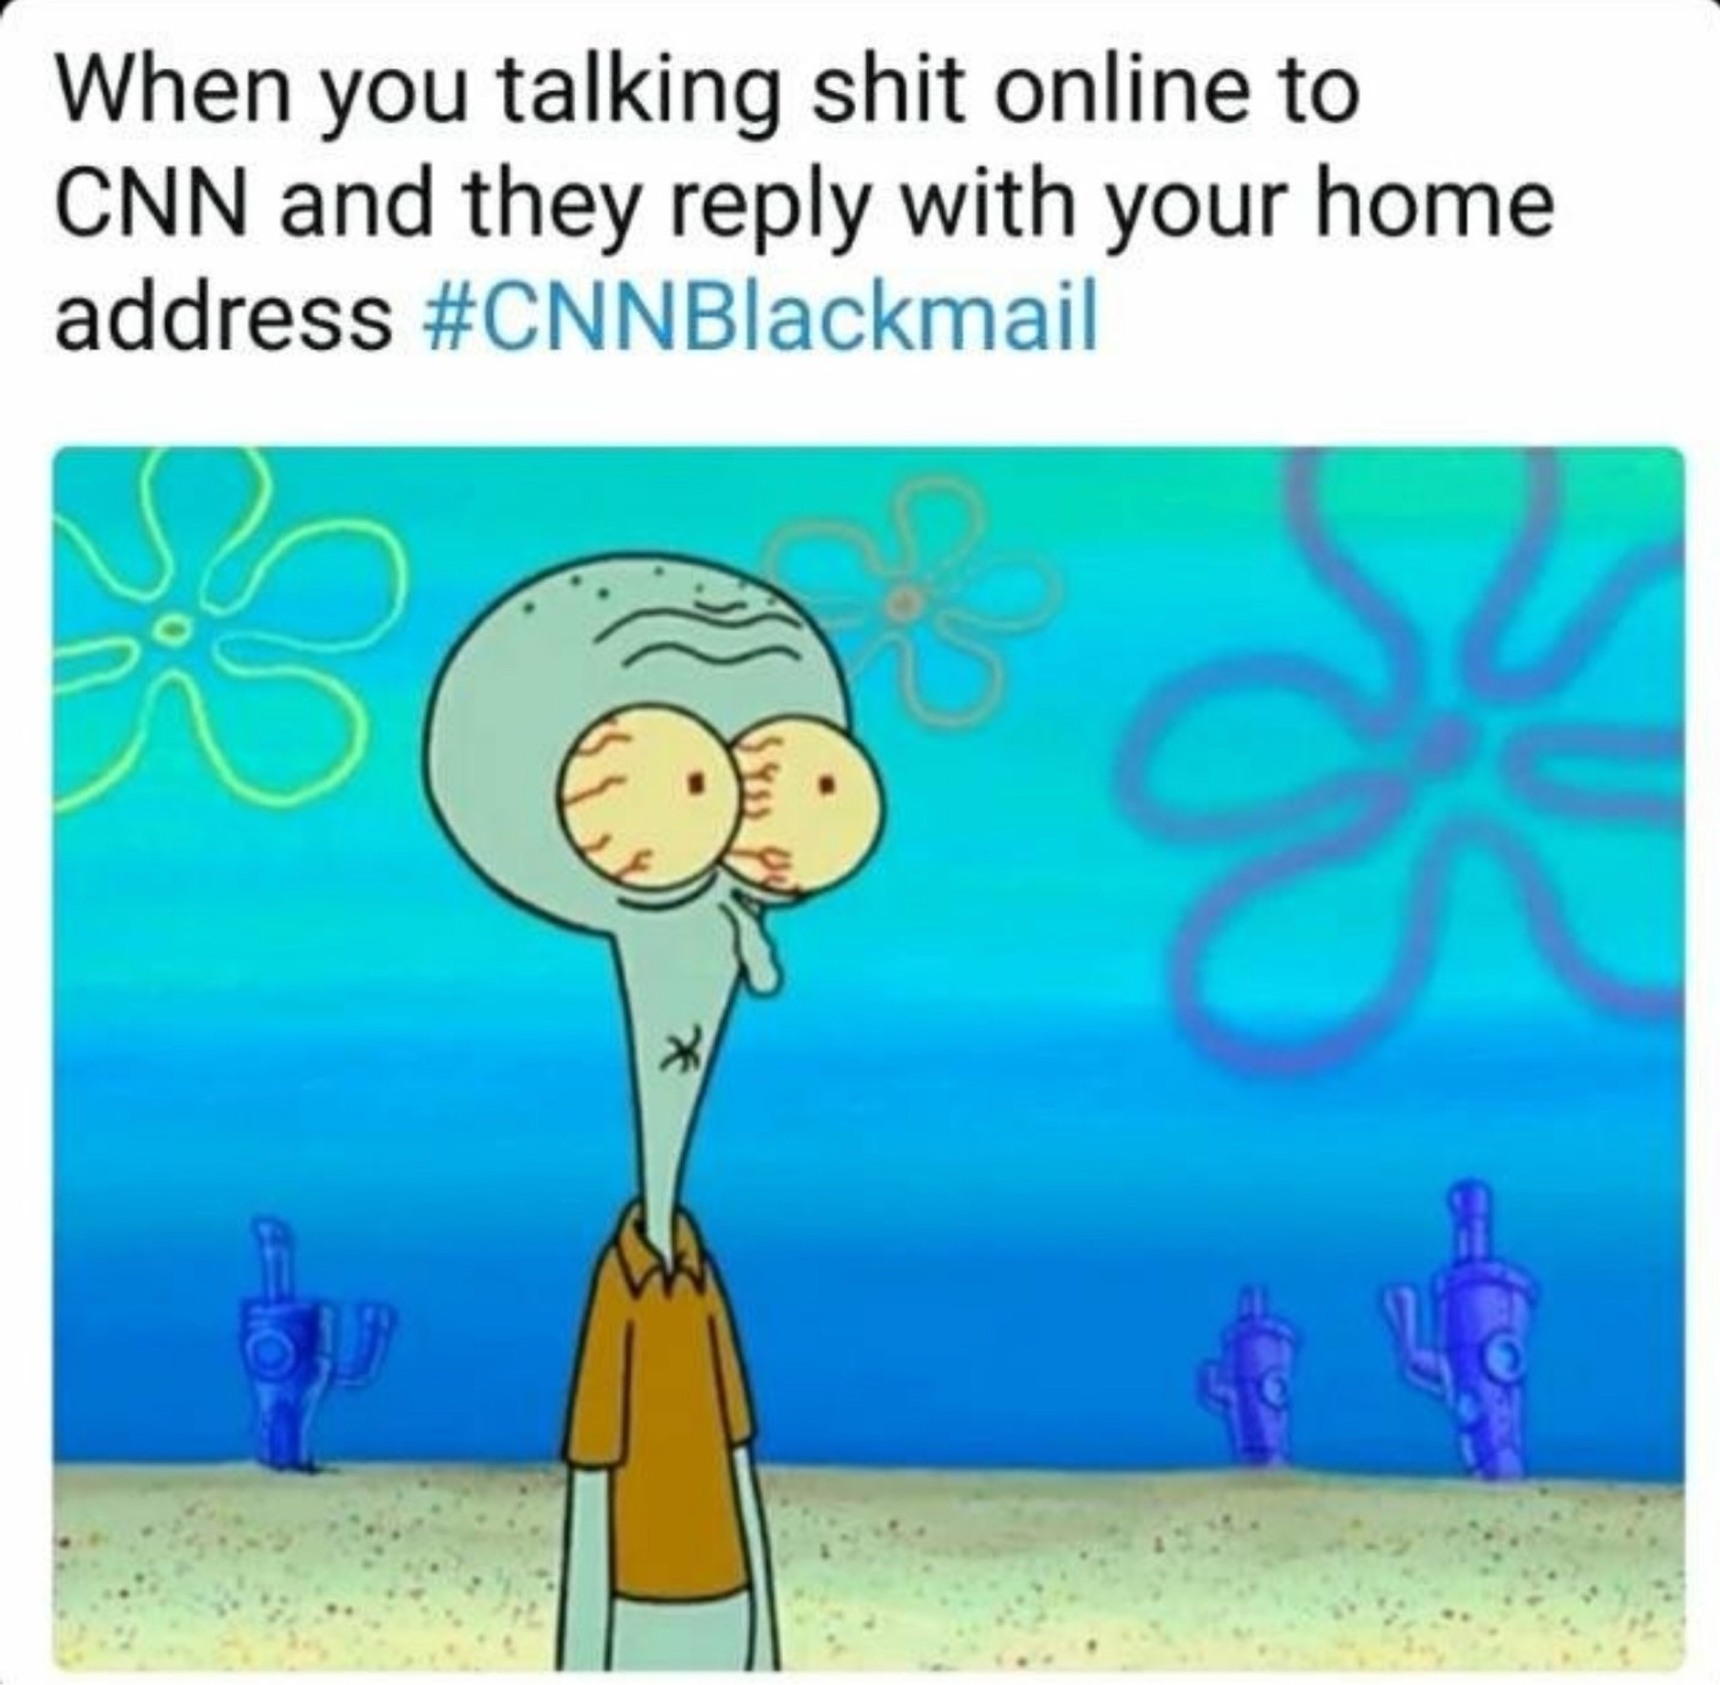 cnn is fake news - meme